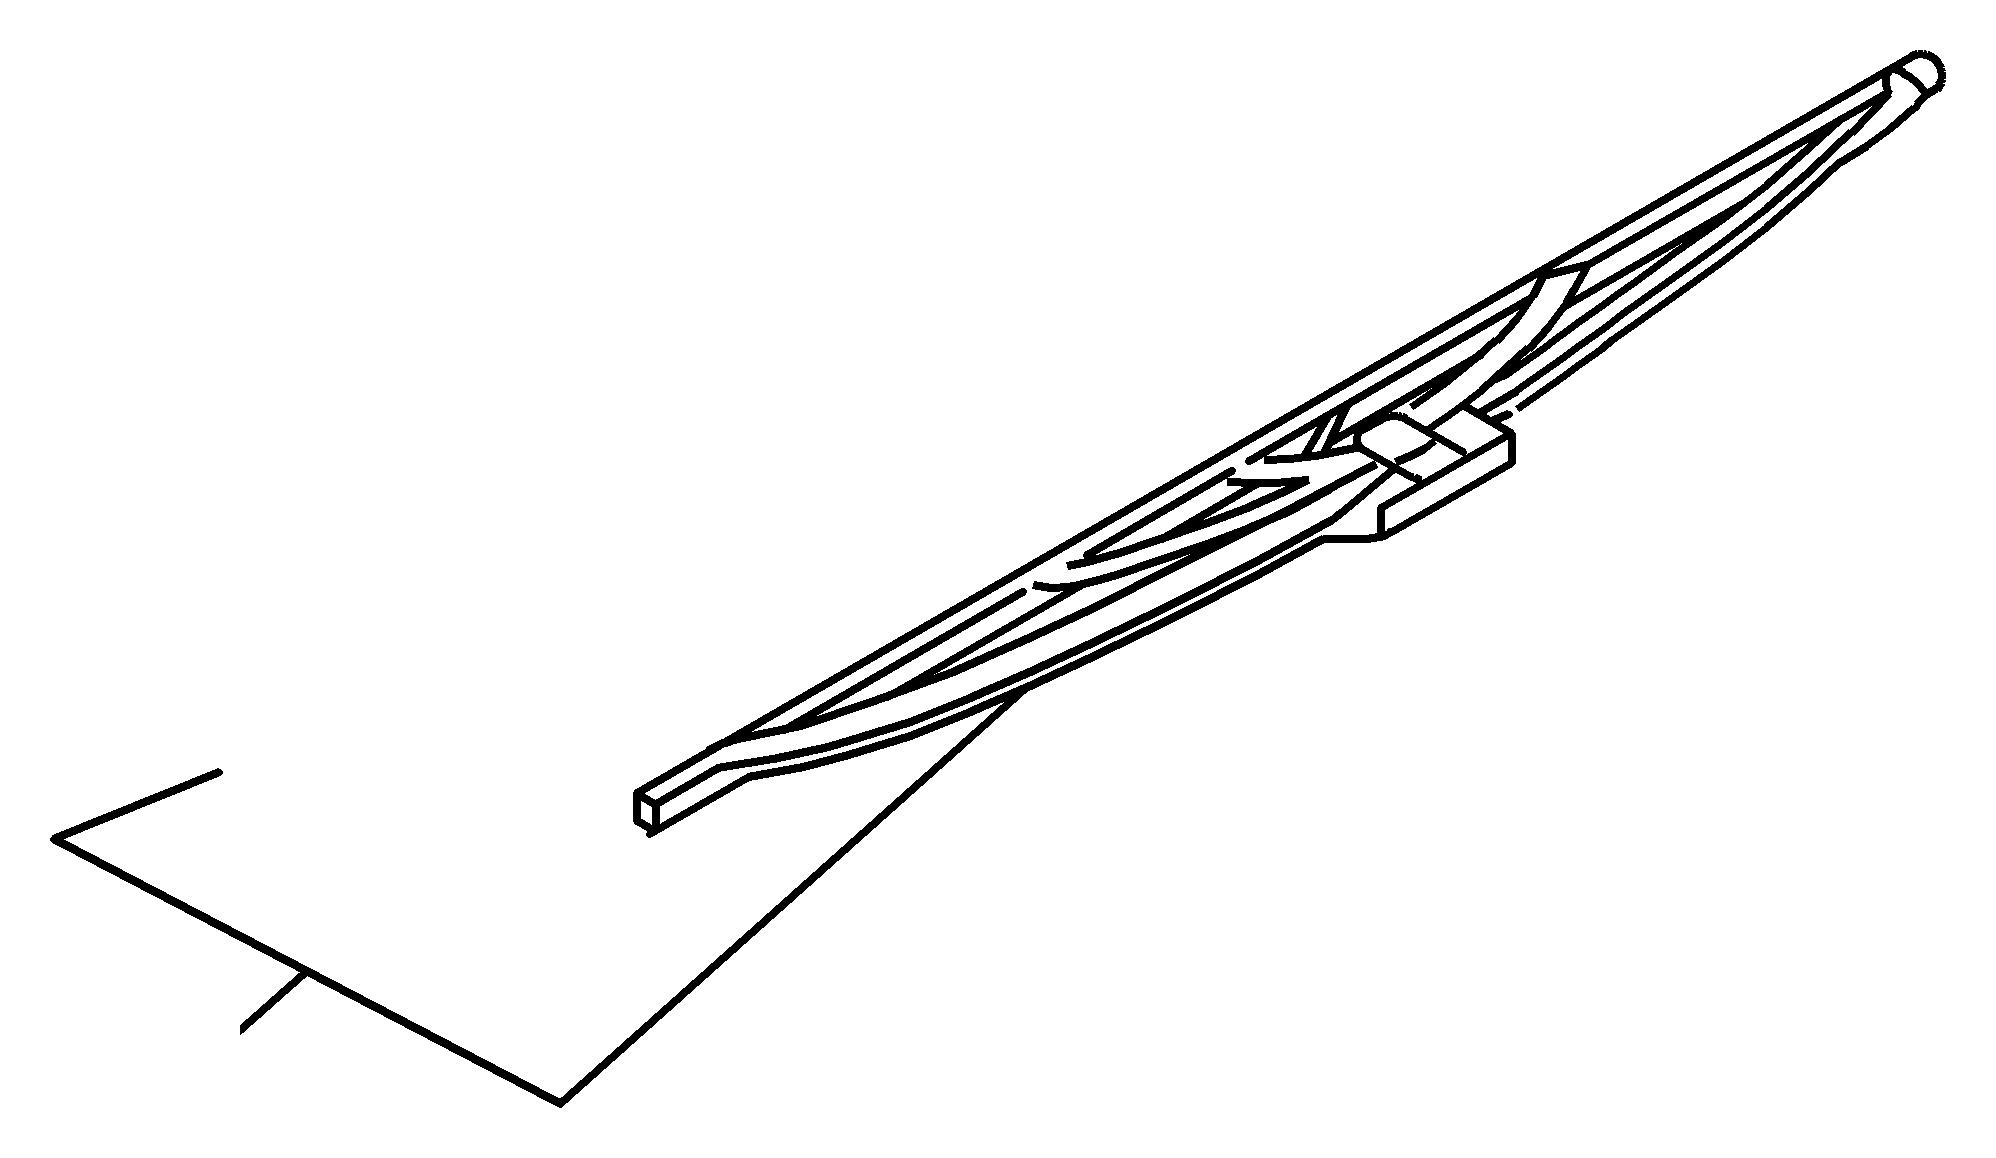 2-94029-001-0 - windshield wiper blade  fleet value  prod  chas  cab